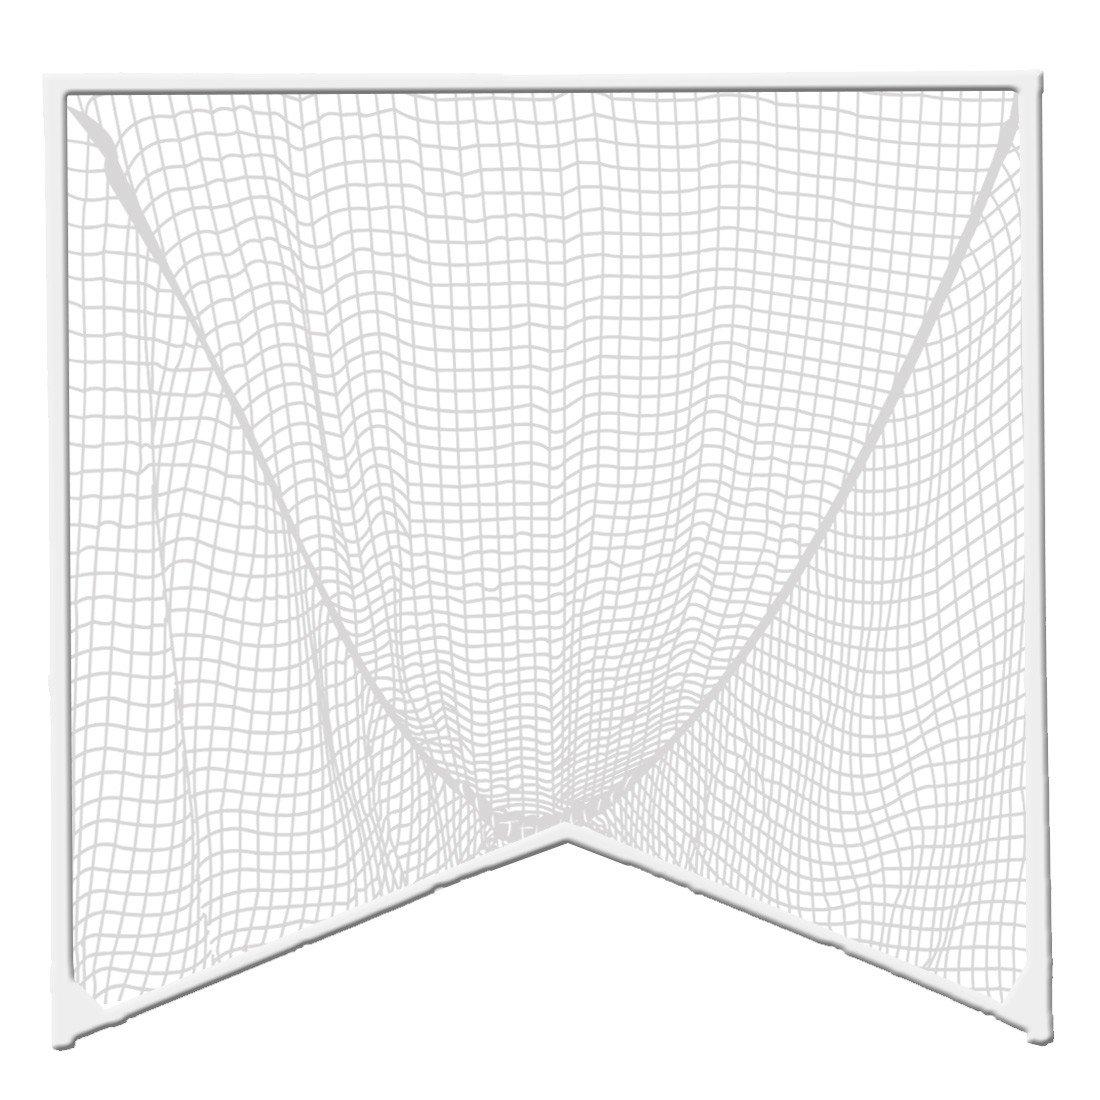 Lacrosse Goal Cliparts Free Download Clip Art.